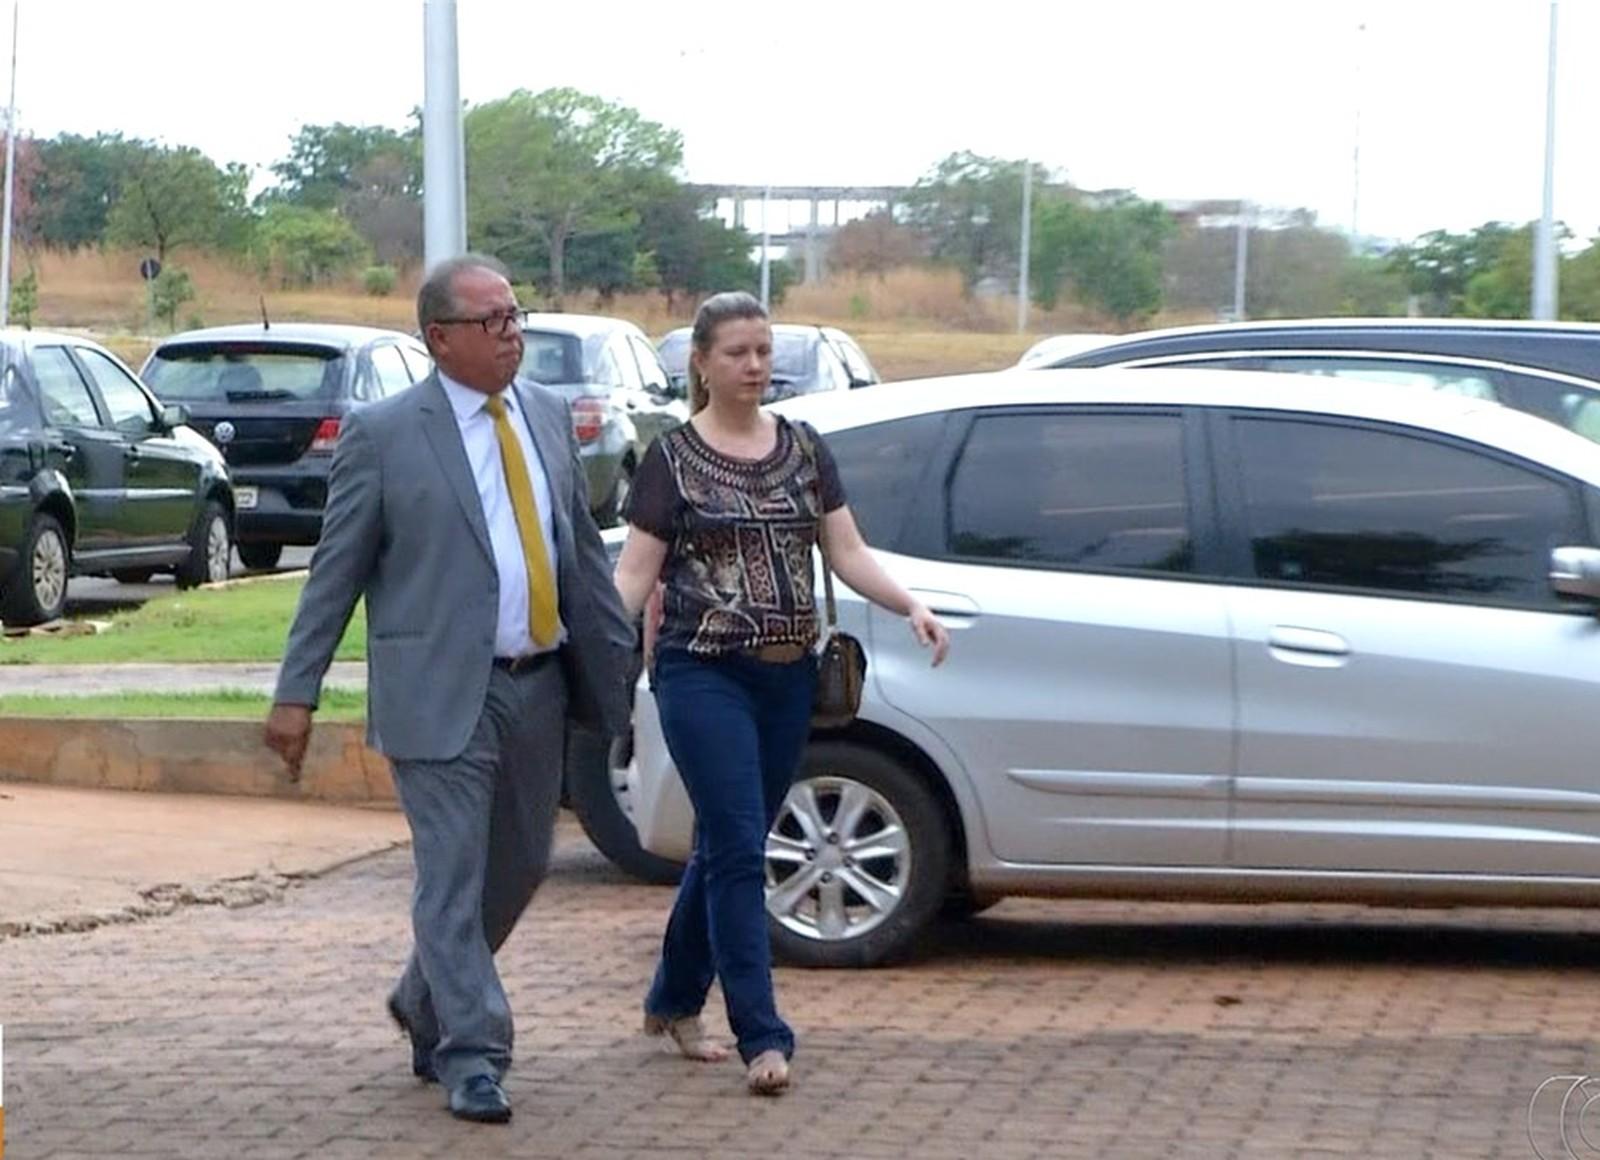 MPF diz que desembargador recebeu R$ 300 mil para liberar suspeito de encomendar chacina